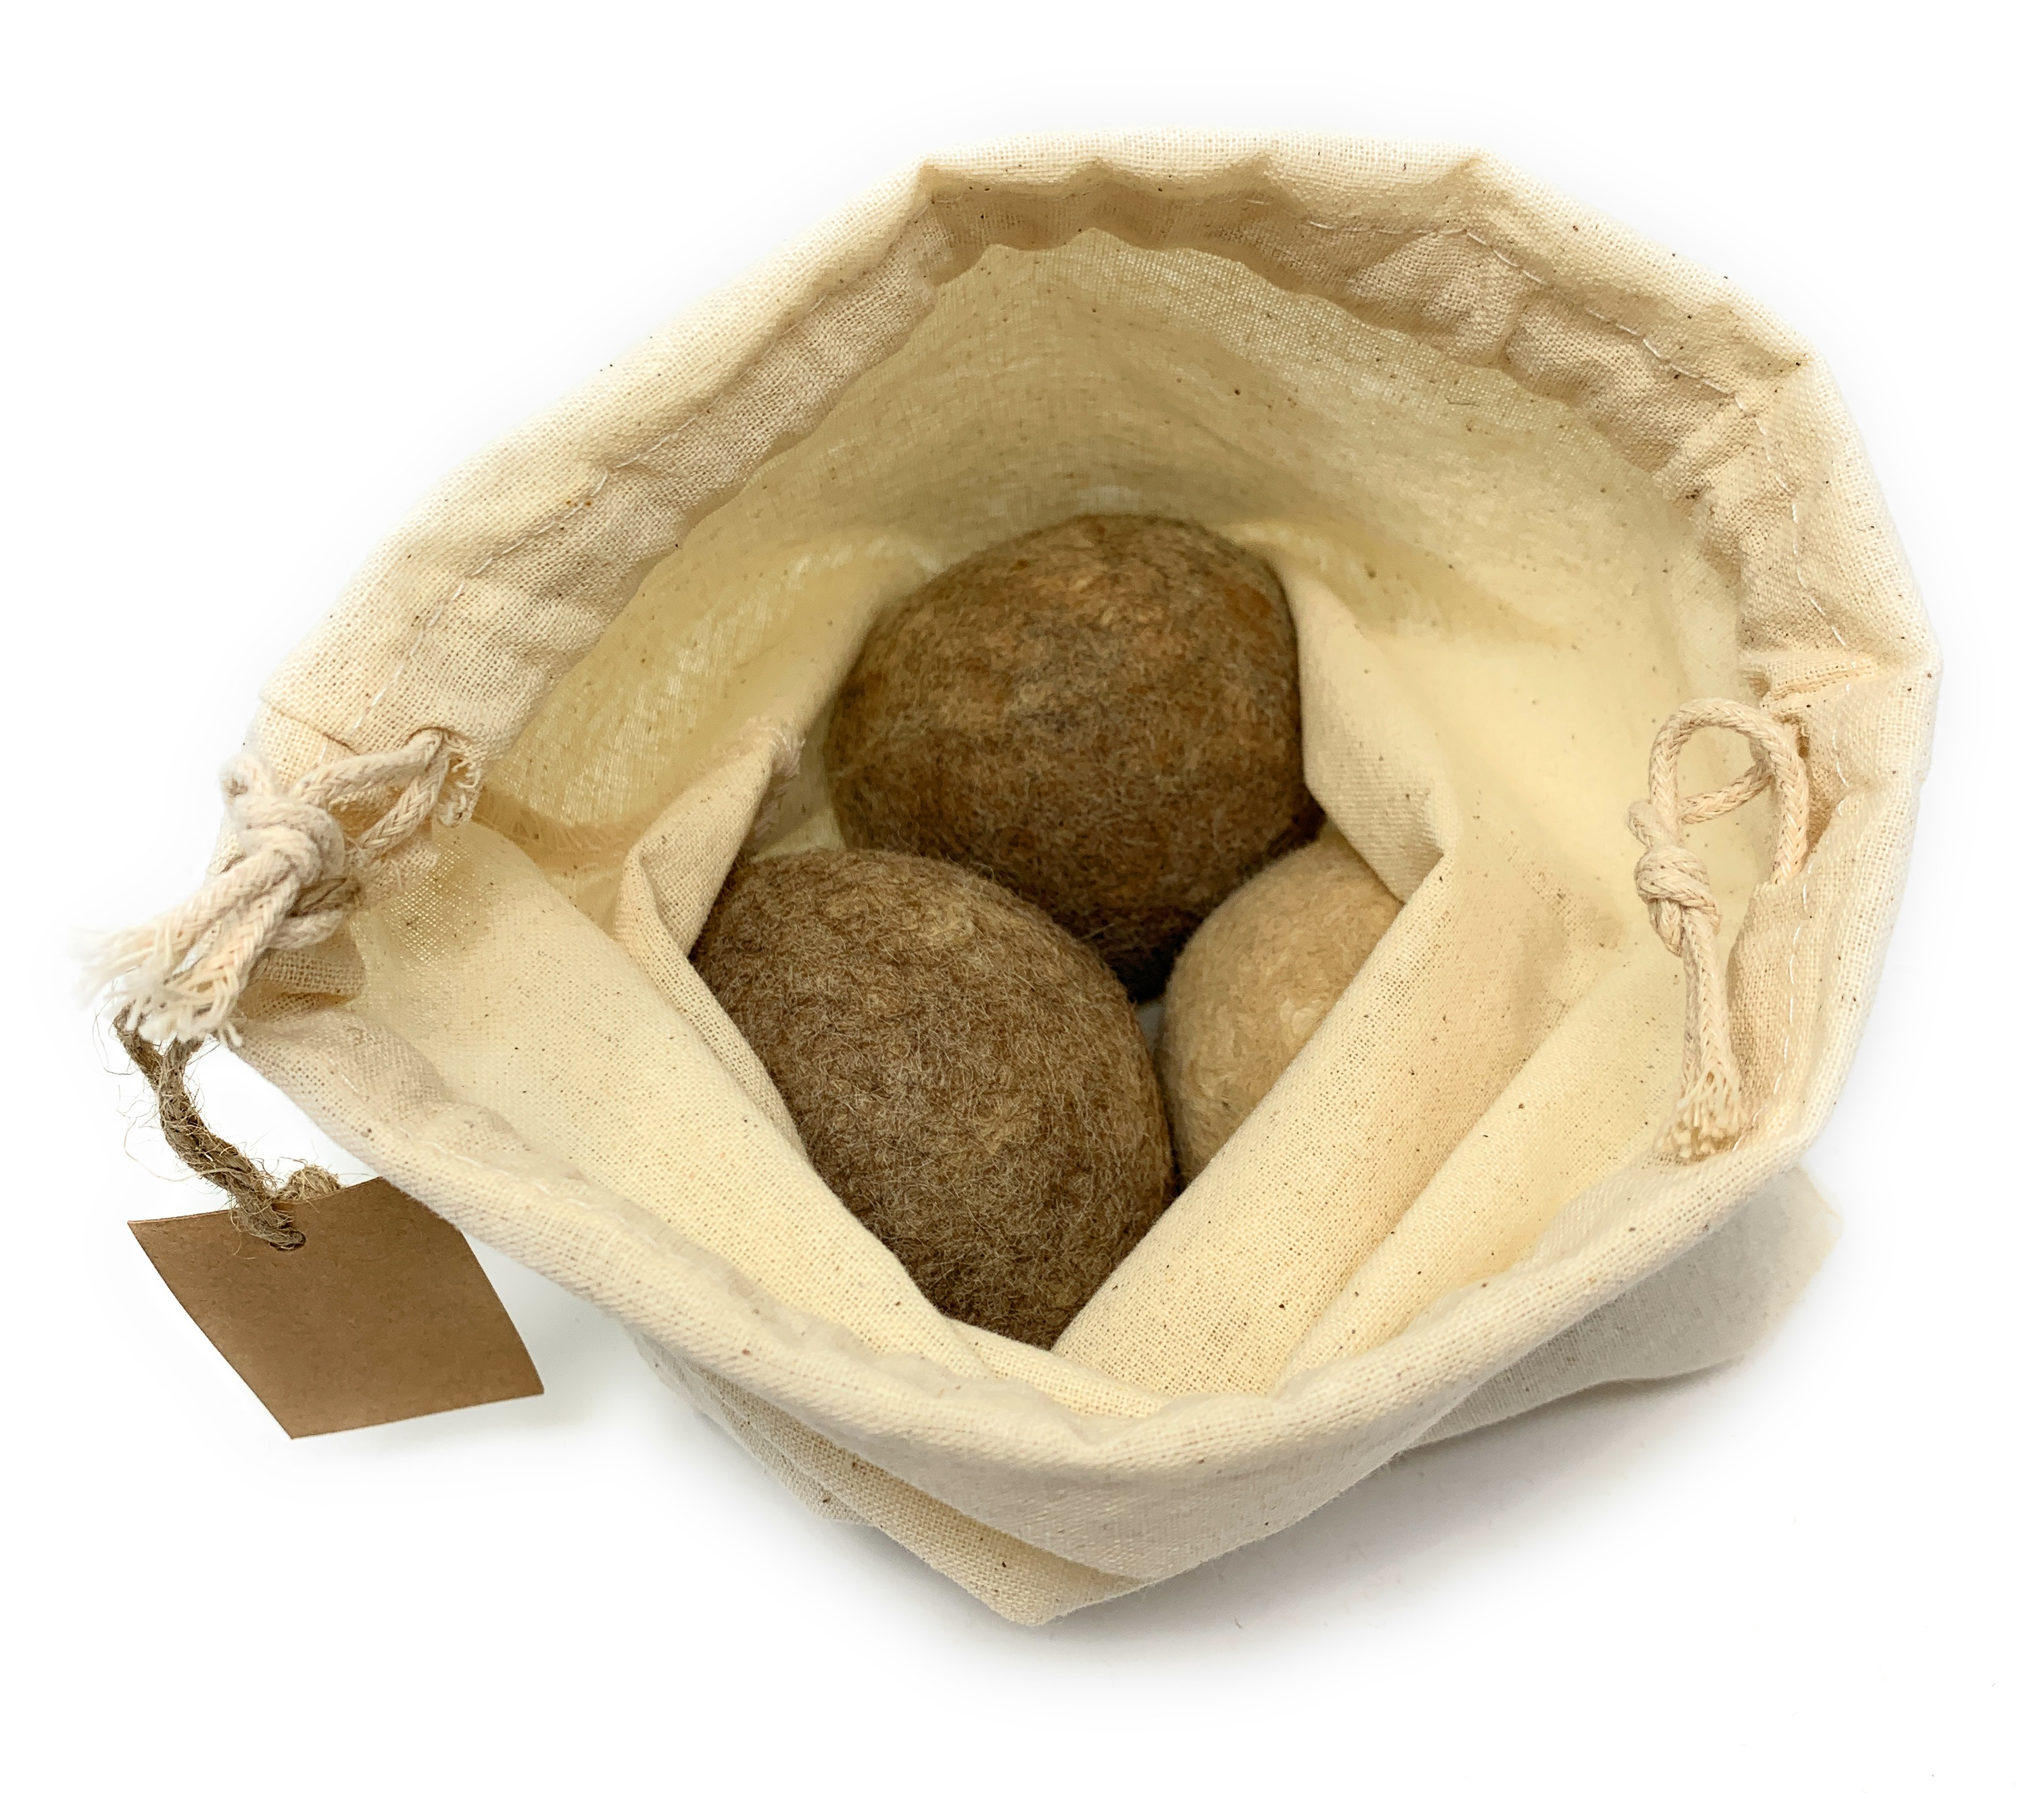 100% Alpaca Wool Dryer Balls - Bagged